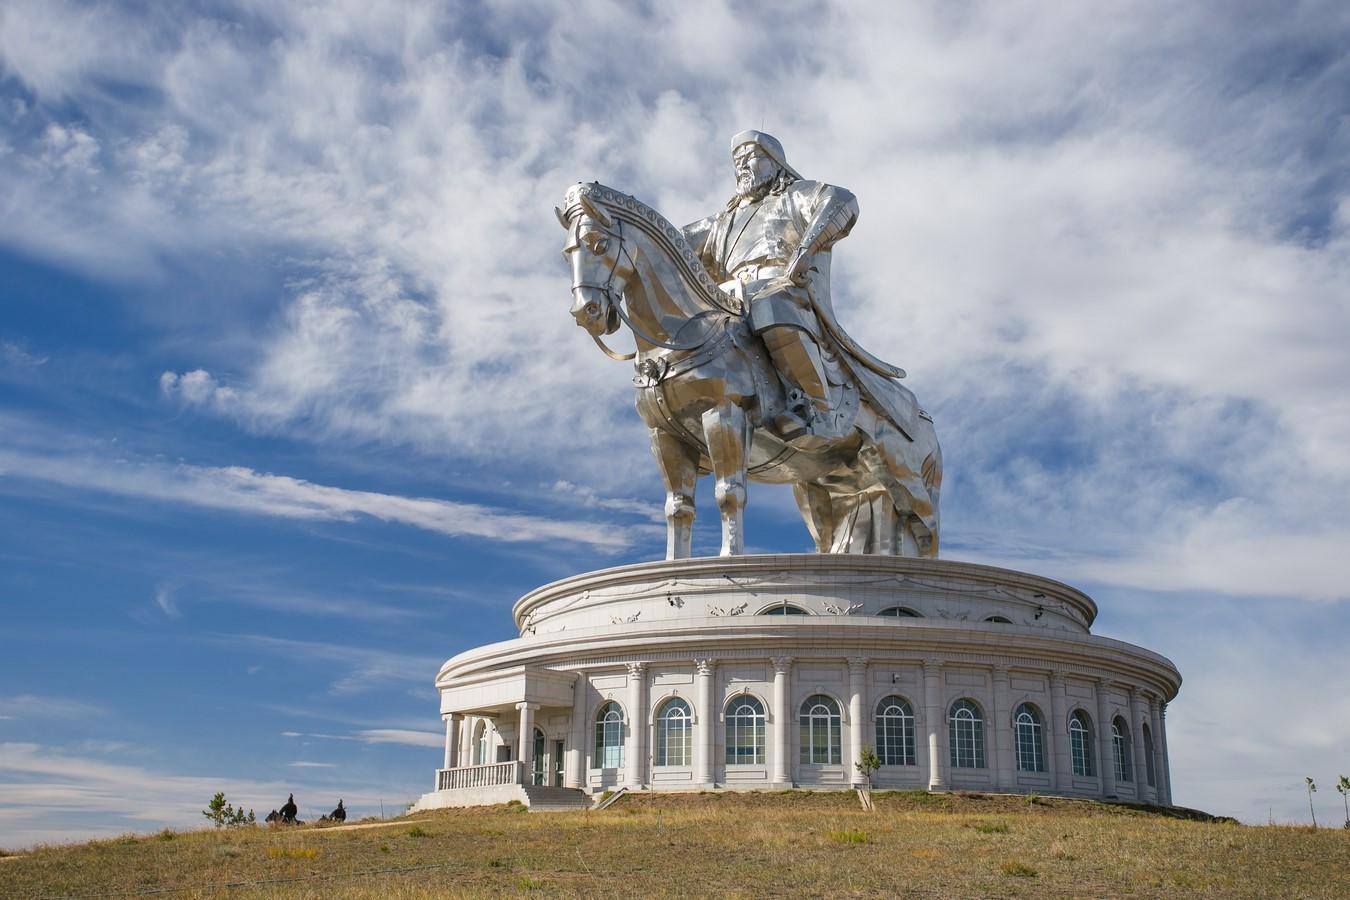 Genghis Khan Equestrian Statue - Sheet1